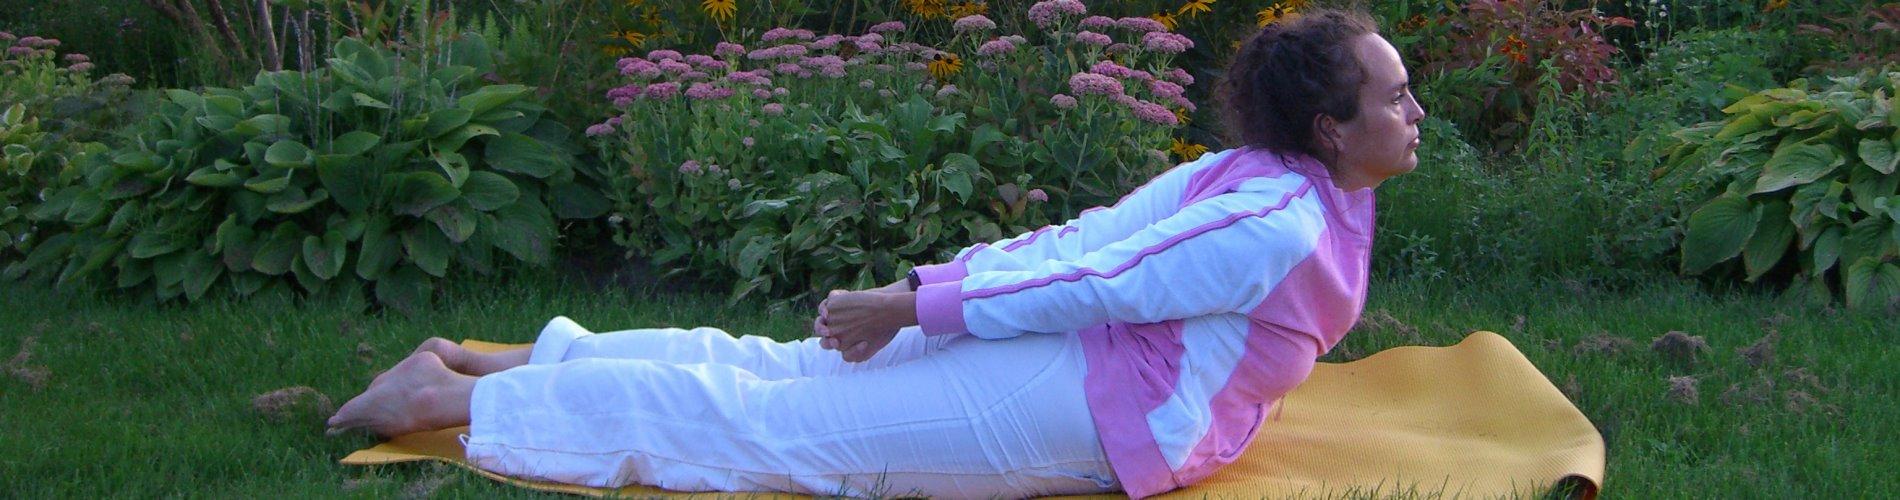 Hatha Yoga Kurse im Wendland